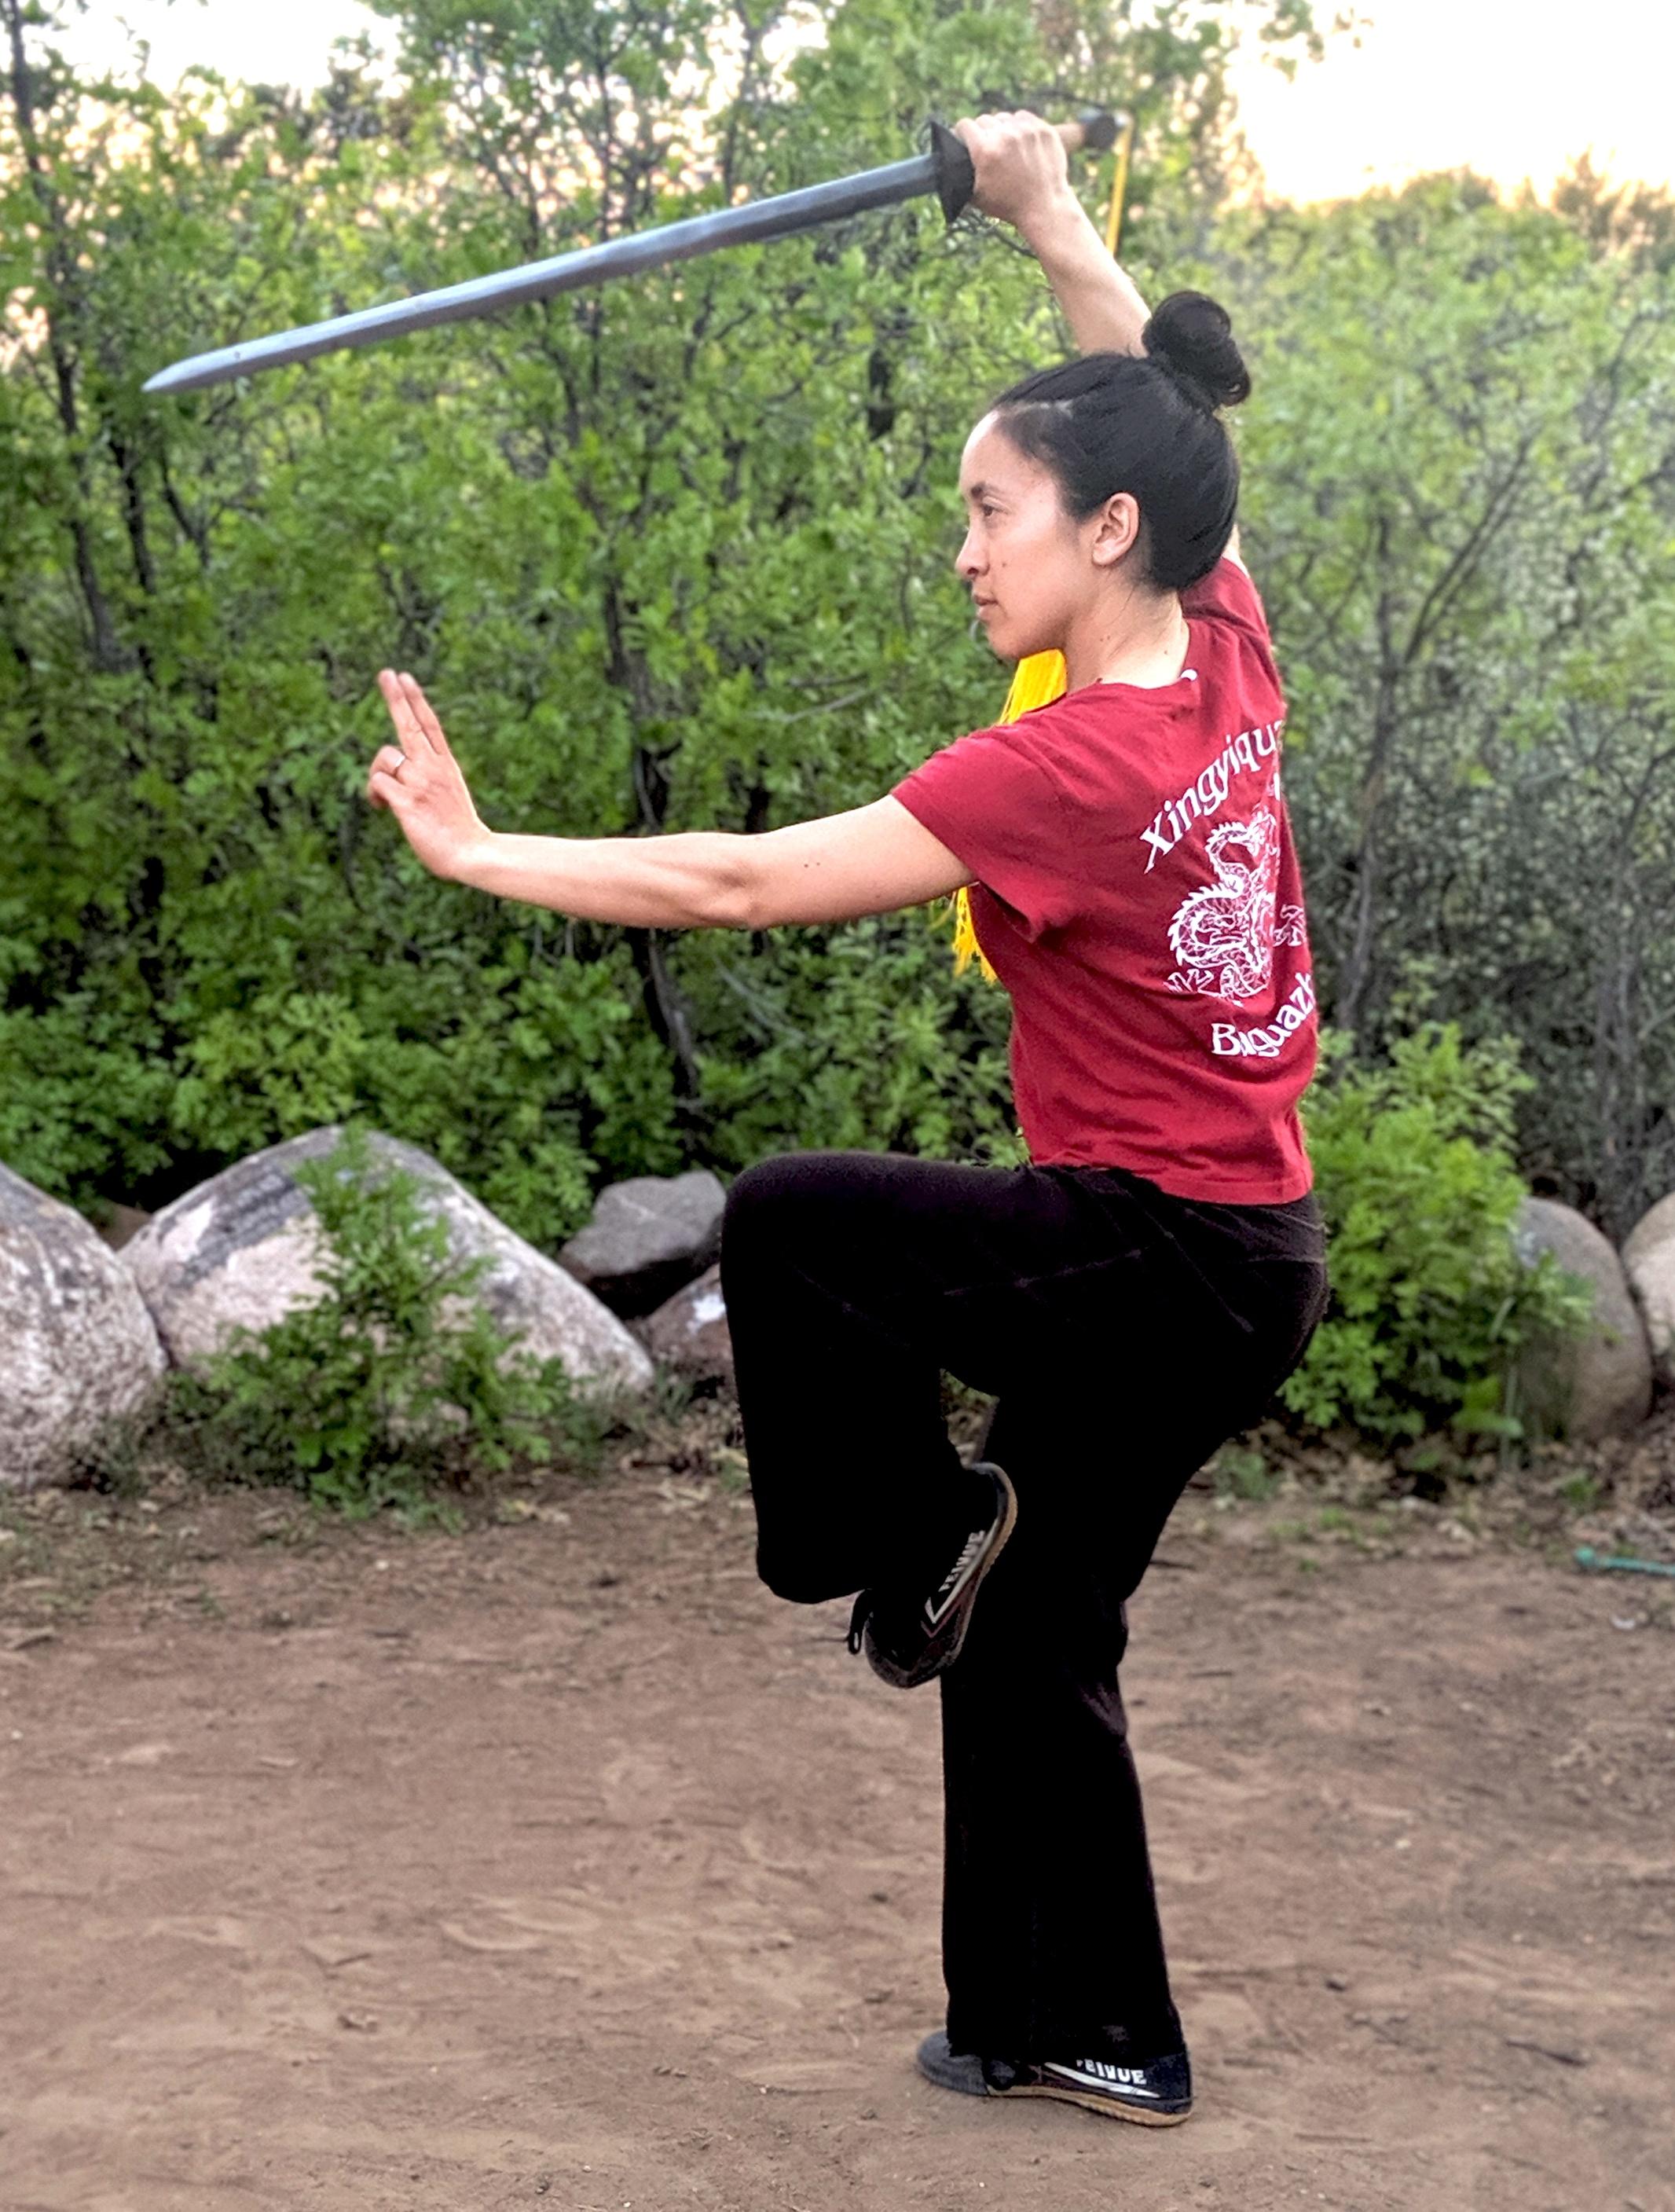 Leilani Navar Straight Sword Gold Mountain Arts